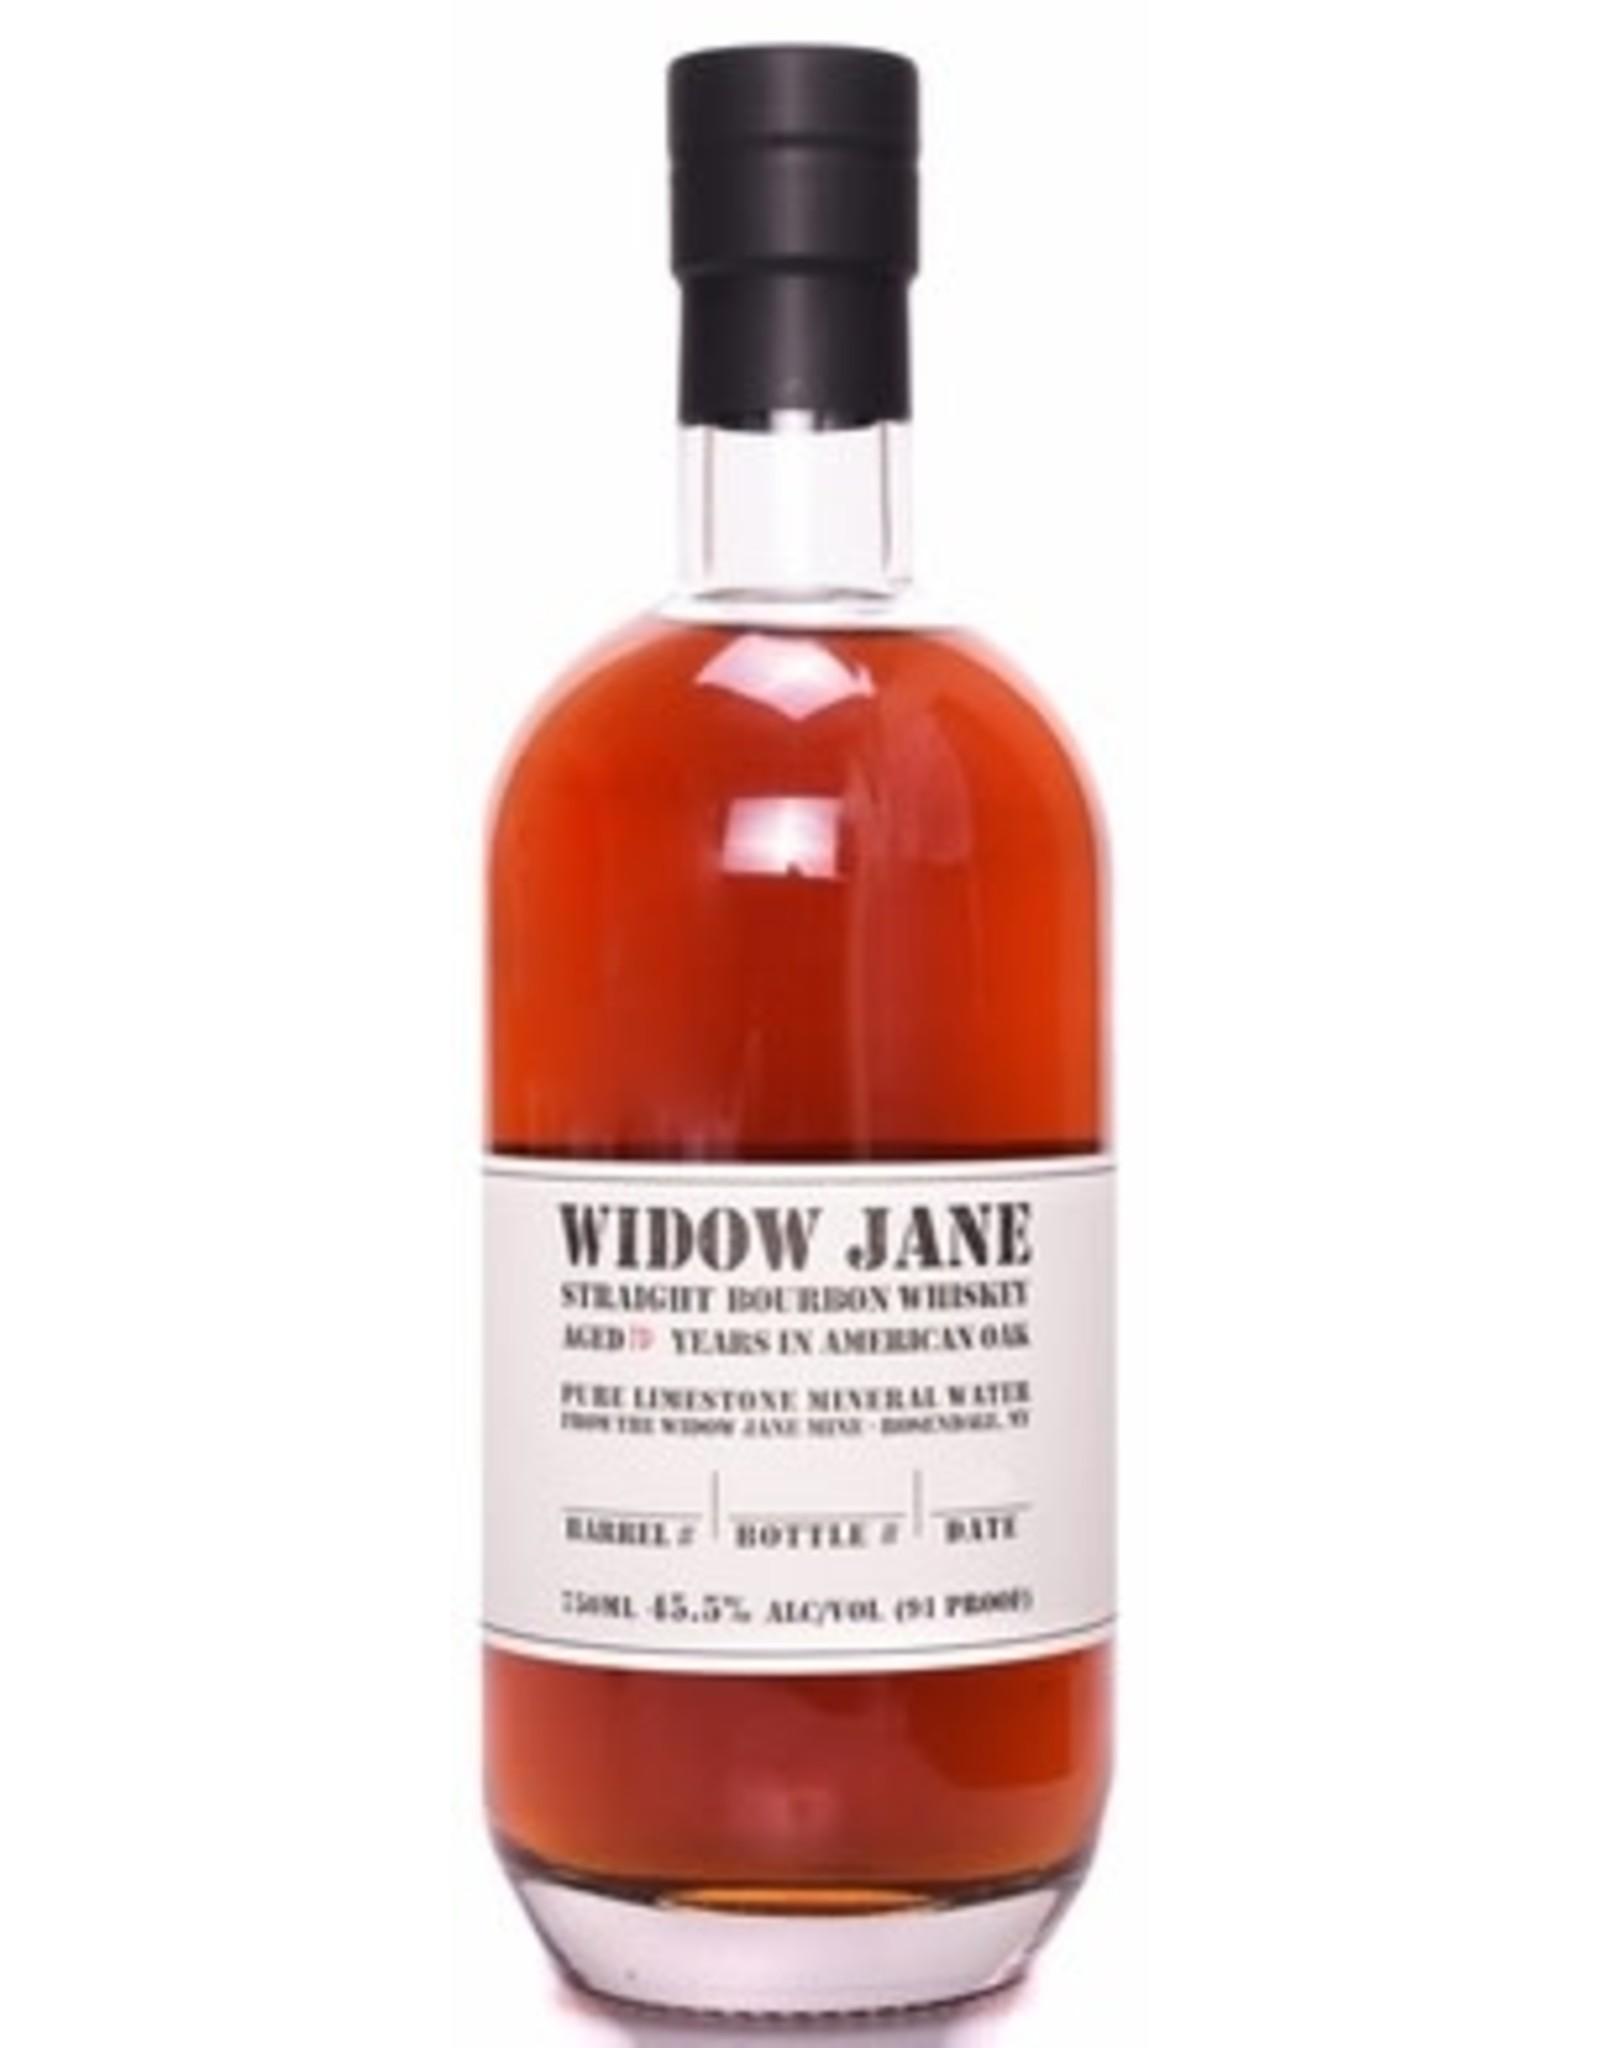 Widow Jane 10 Year Straight Bourbon